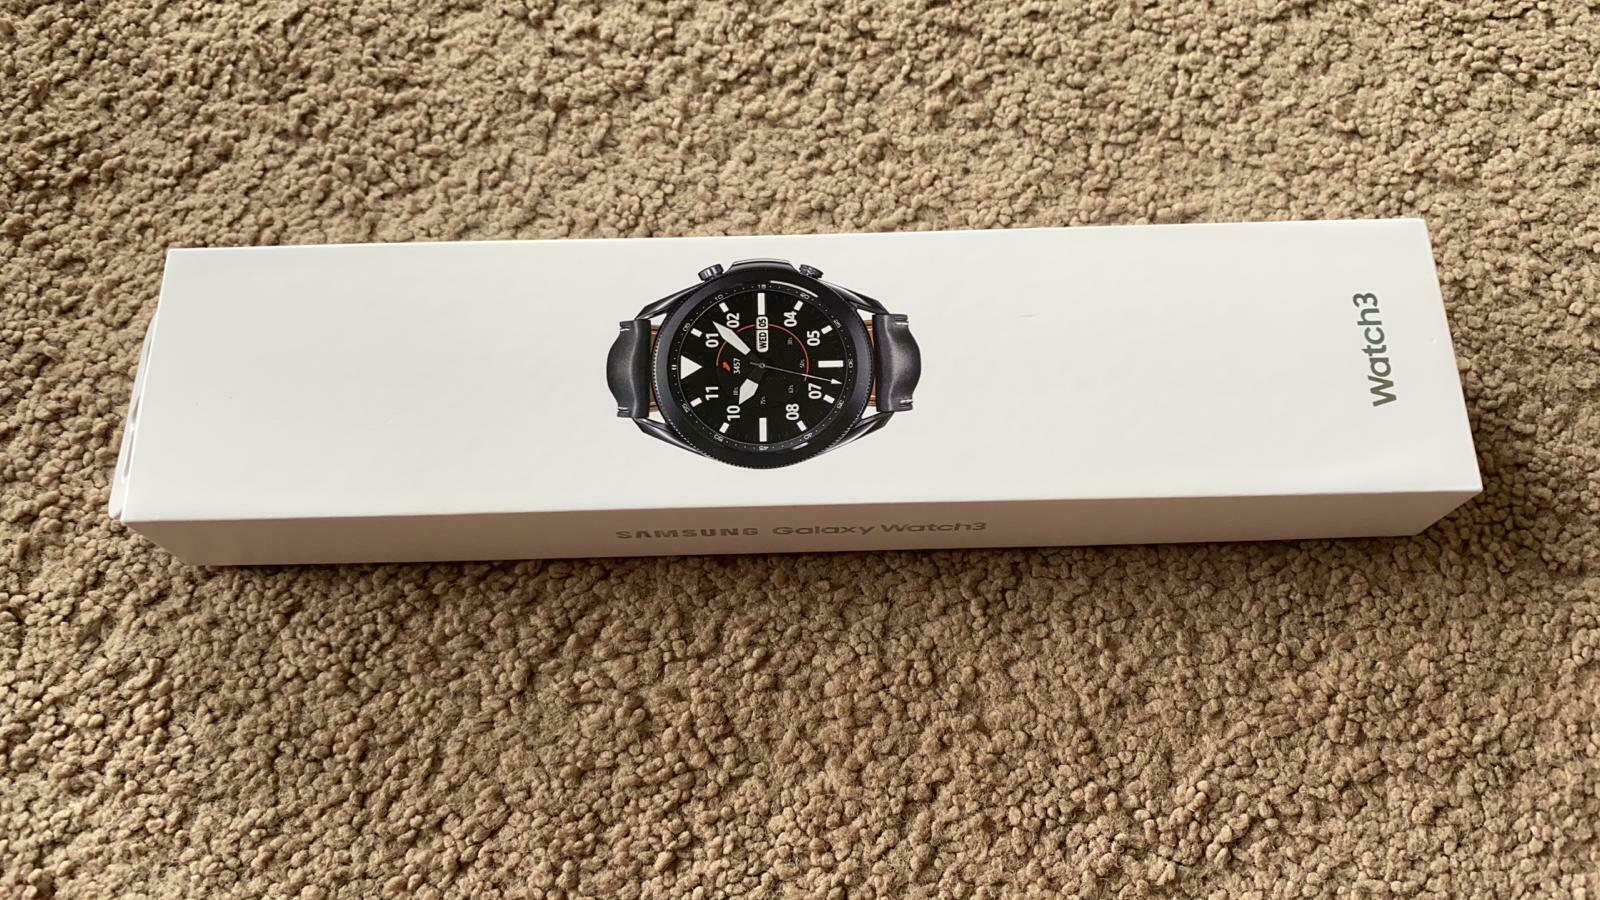 New !!! Samsung Galaxy Watch3 Smartwatch 45mm Stainless BT - Mystic Black 45mm black Featured galaxy mystic new samsung smartwatch stainless watch3